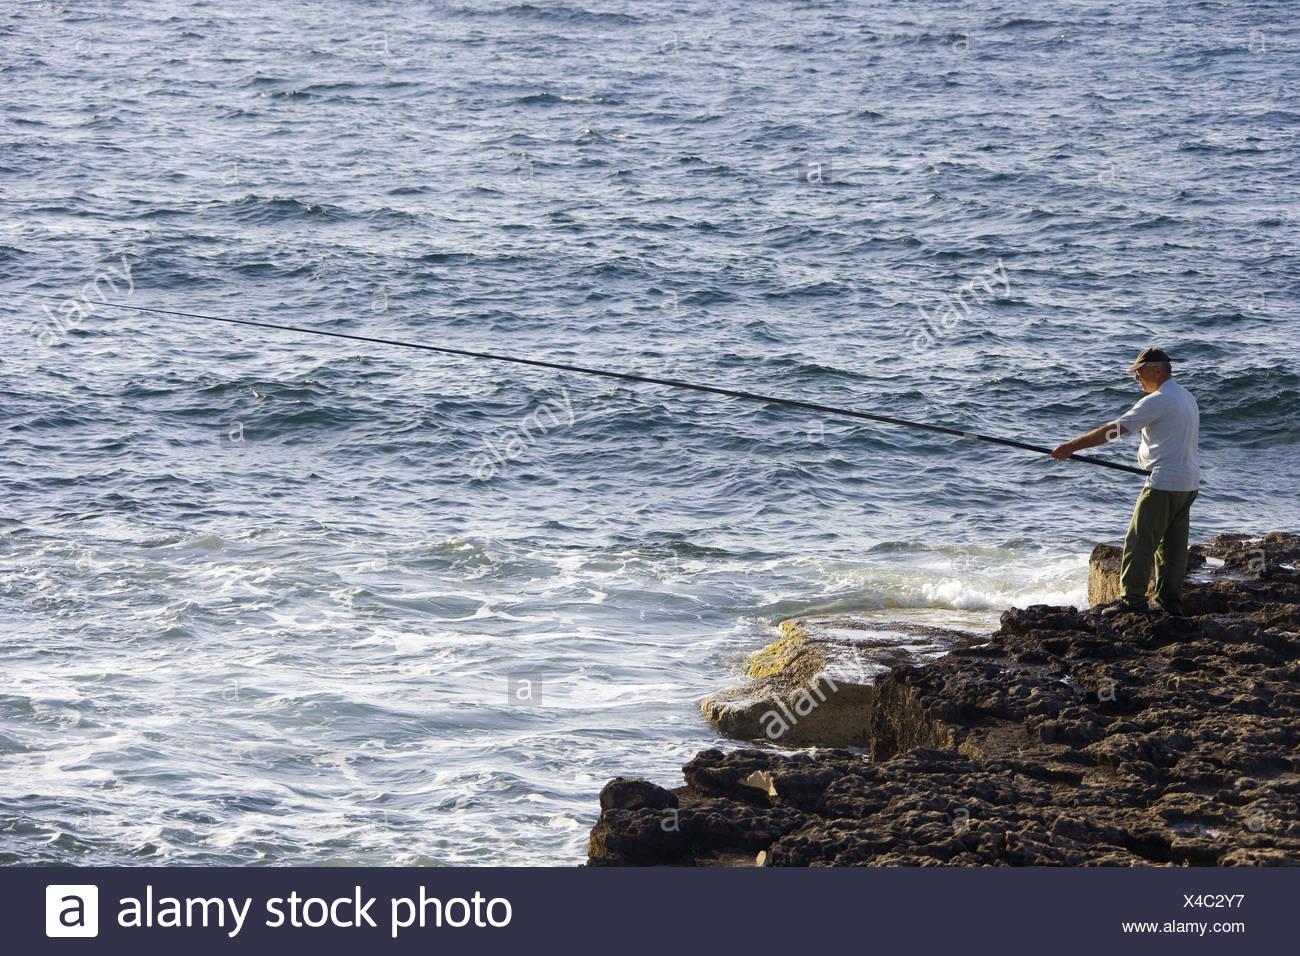 Cyprus, bile coast, angler, sea, - Stock Image